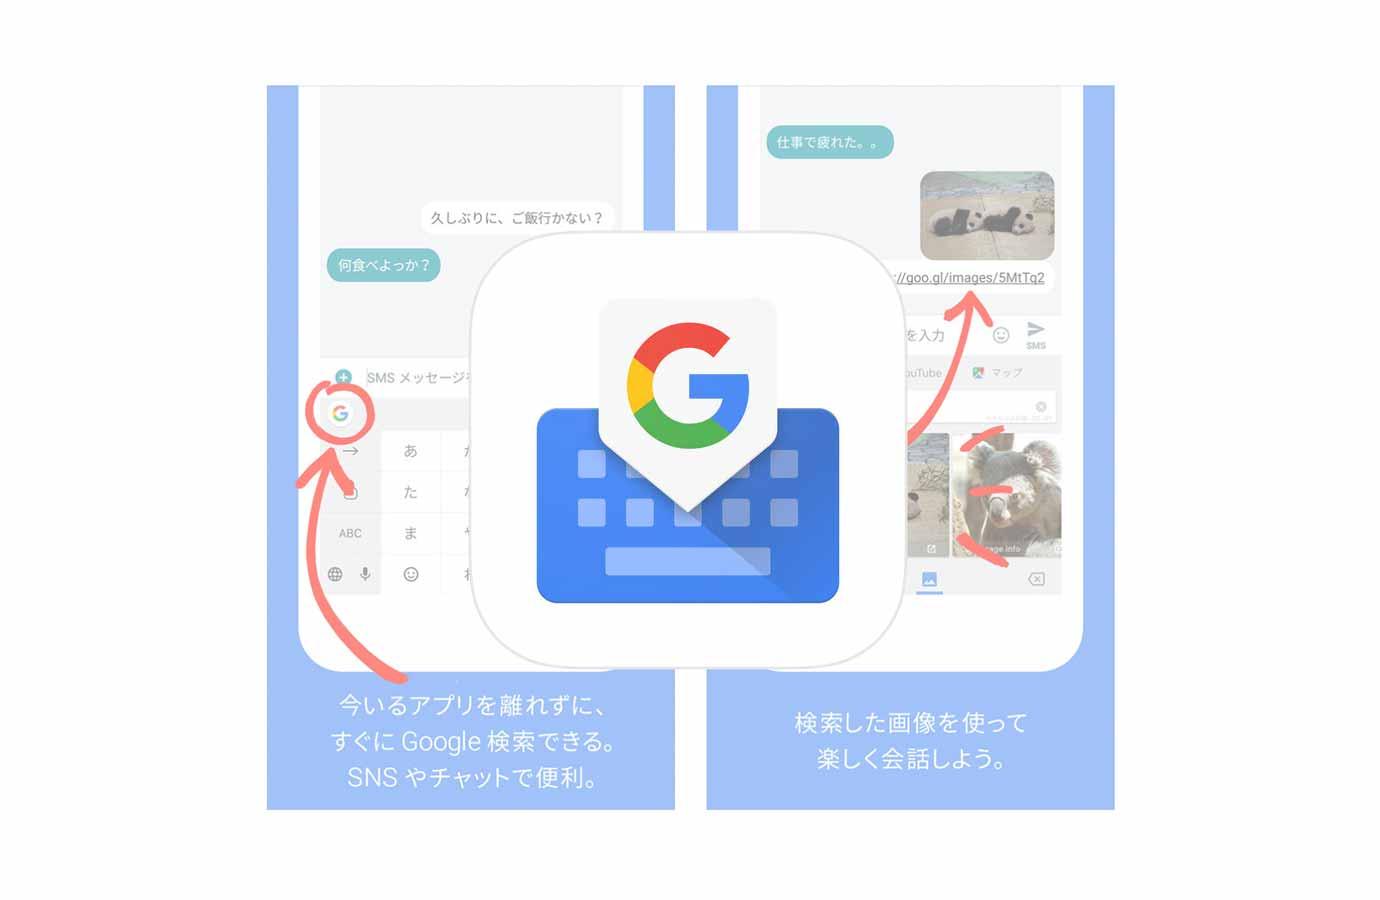 Google、日本語に対応したキーボードアプリ「Gboard 1.11.0」リリース